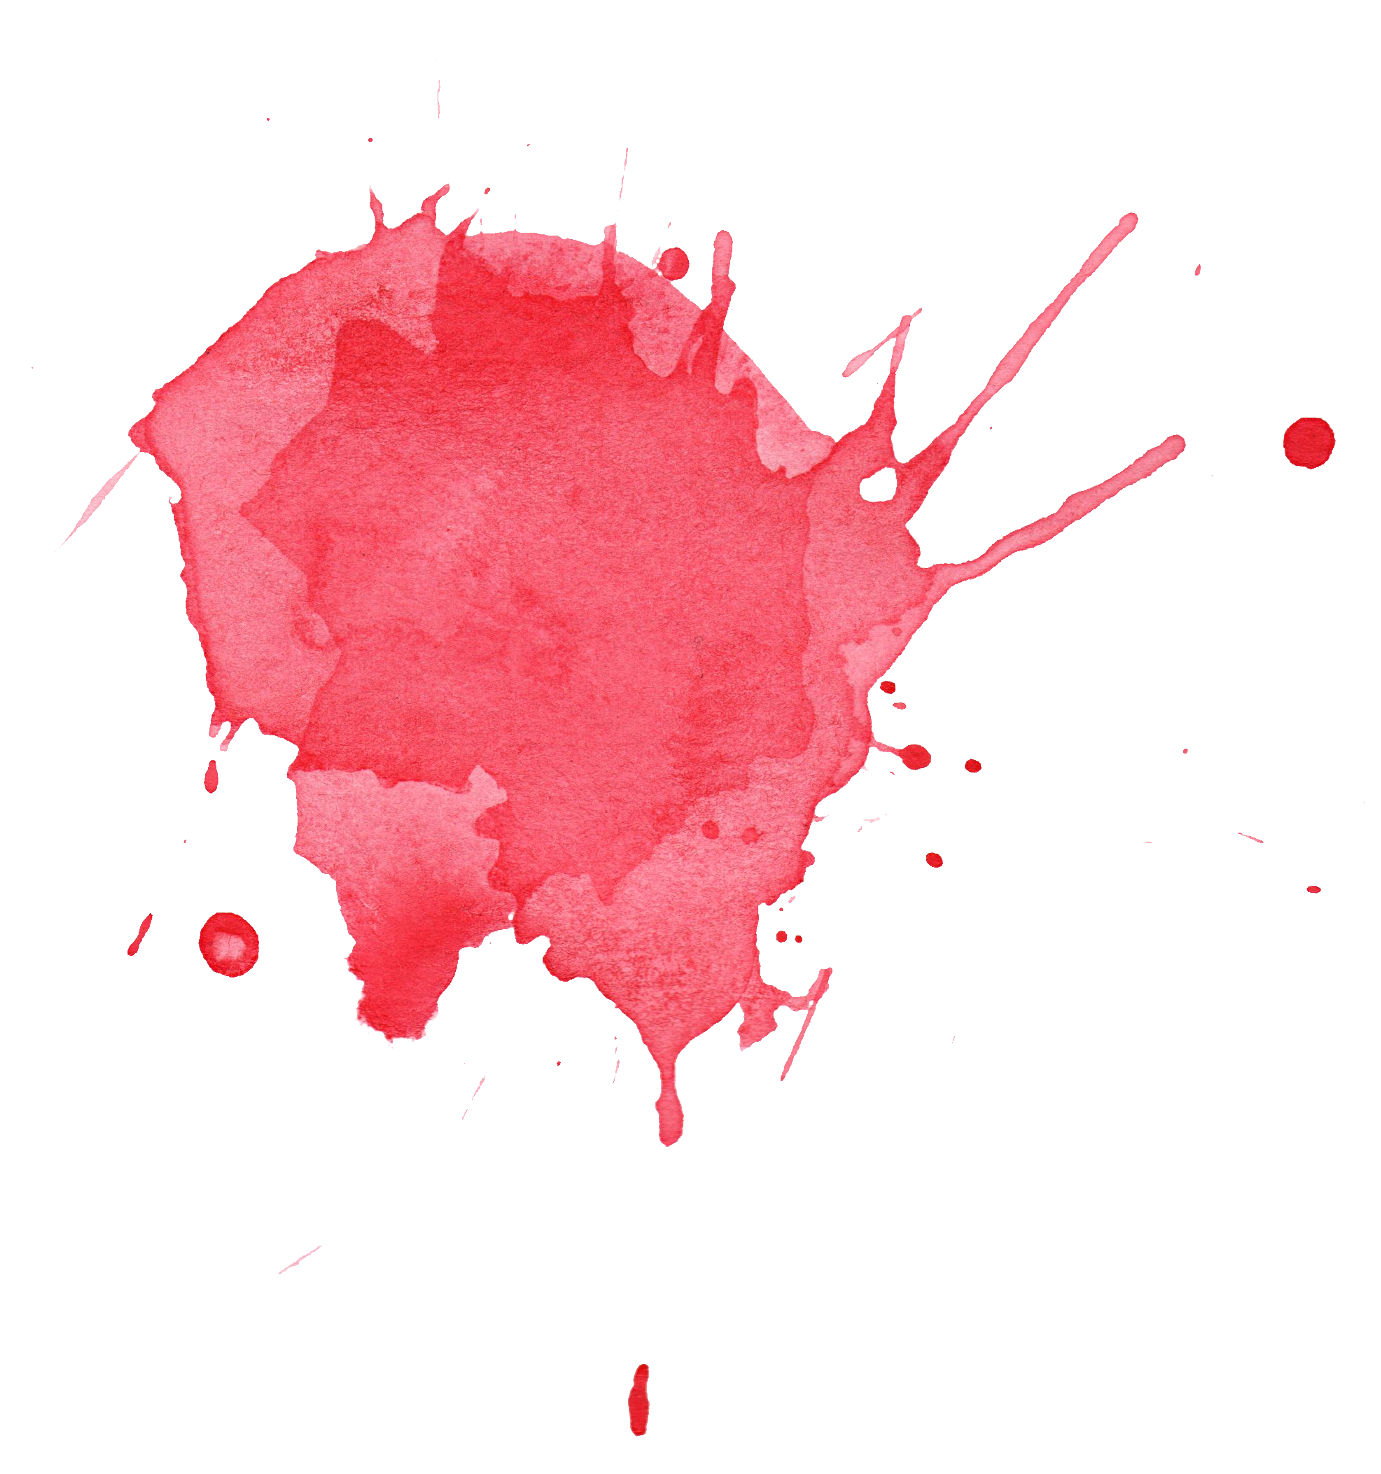 6 Red Watercolor Splatter (PNG Transparent).